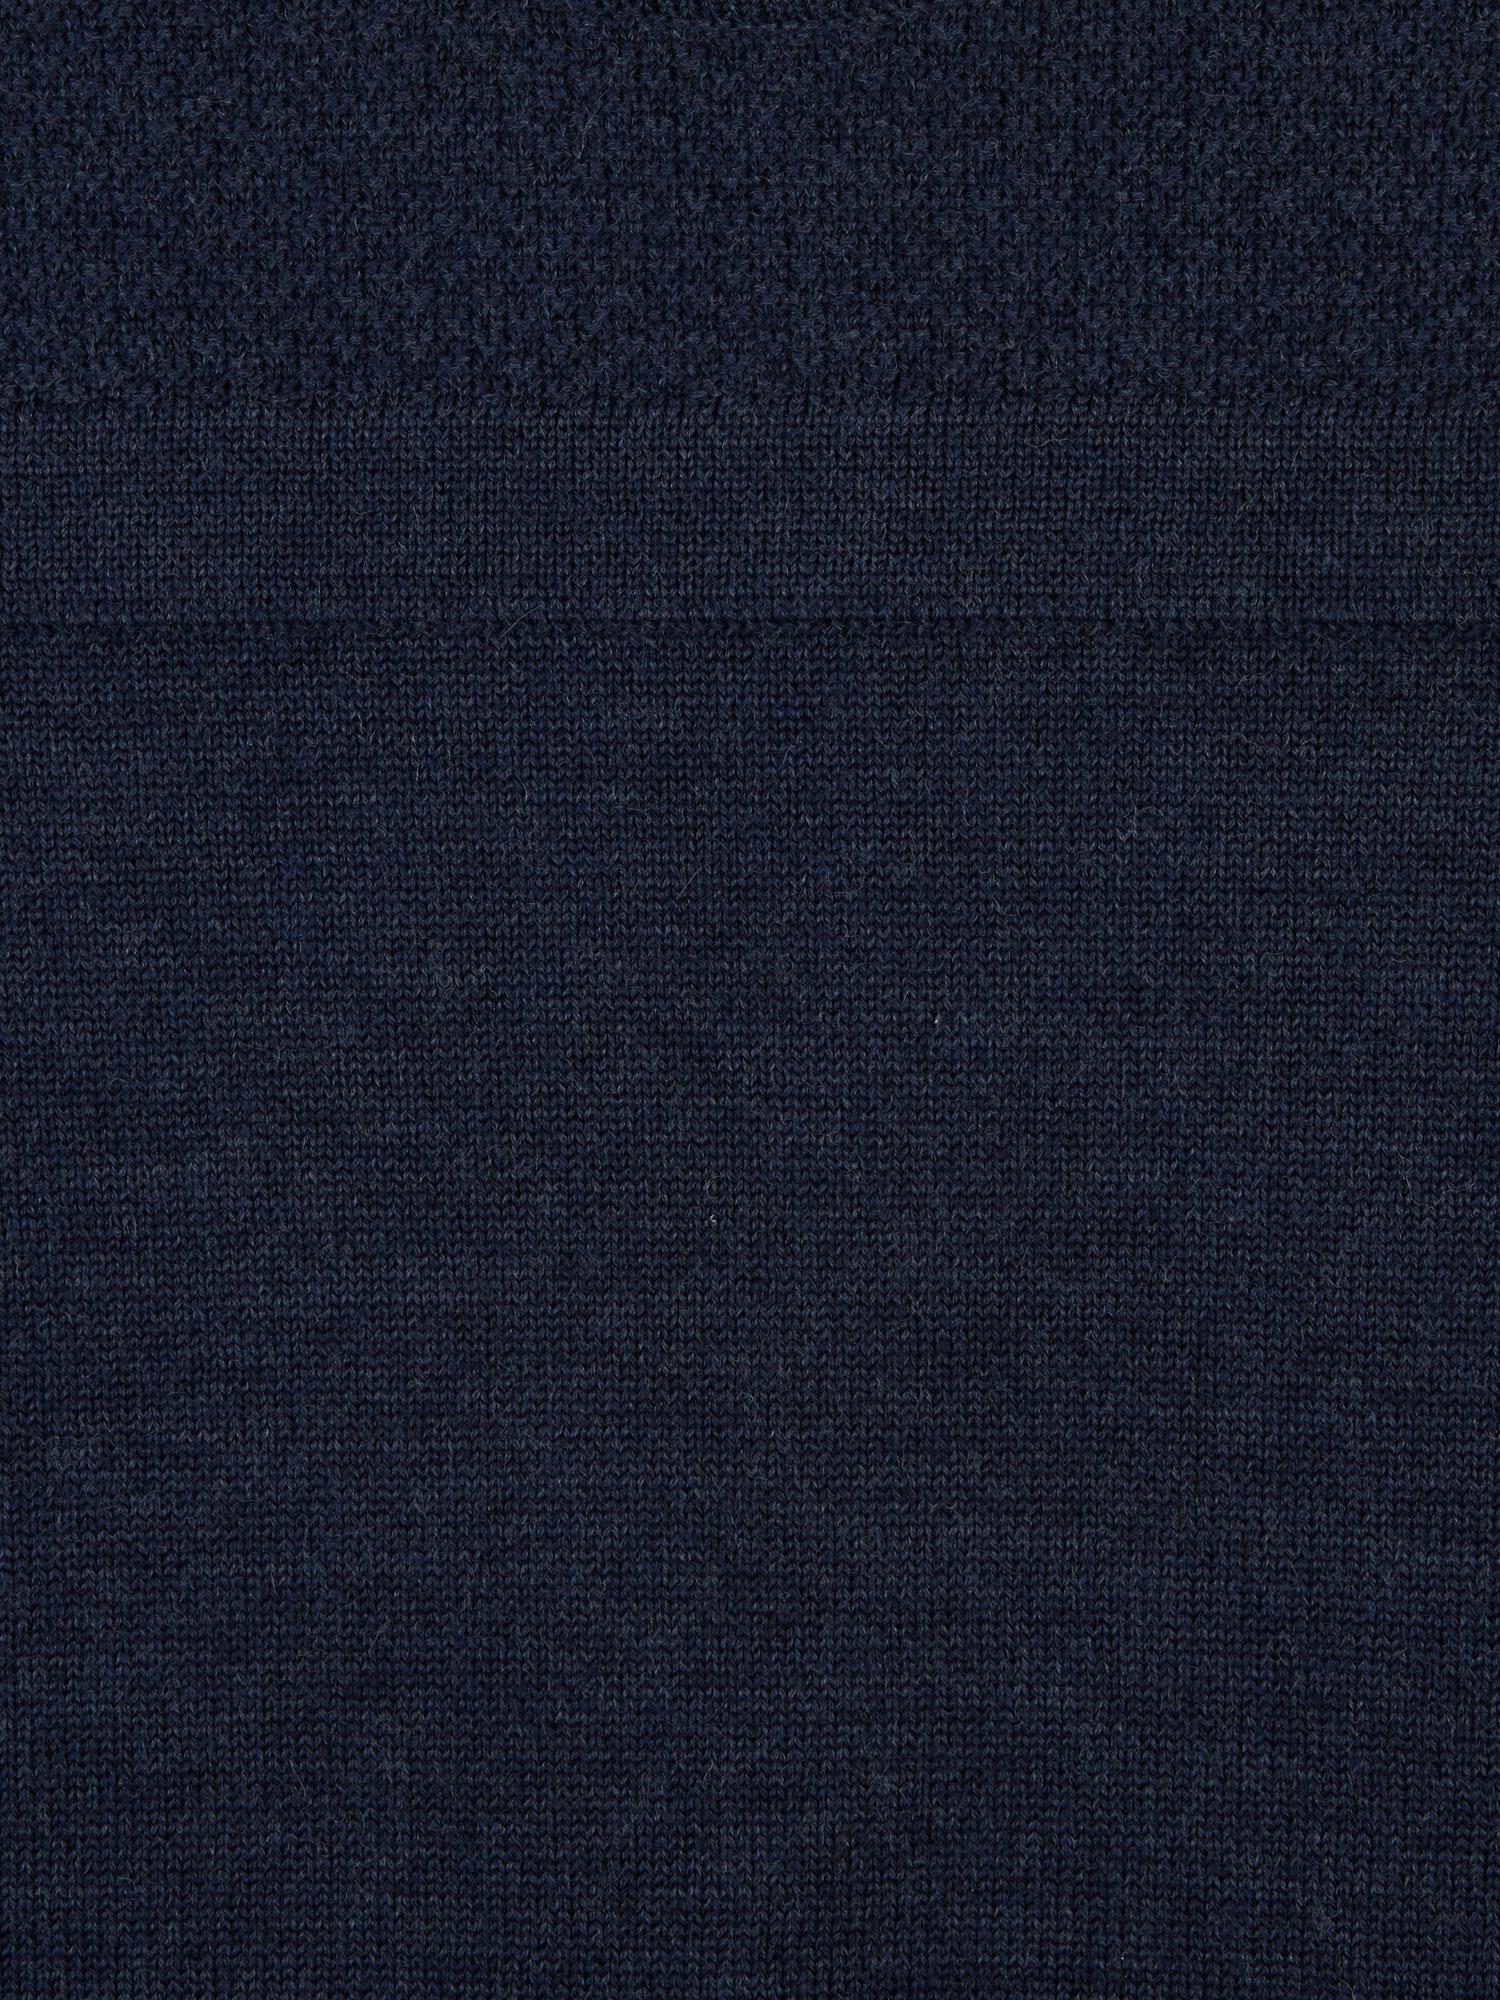 Sweater_M18-03_Clifden Geansai_4 Variations_Indigo_SWATCH_PRO SHOT_WEB RES.jpg